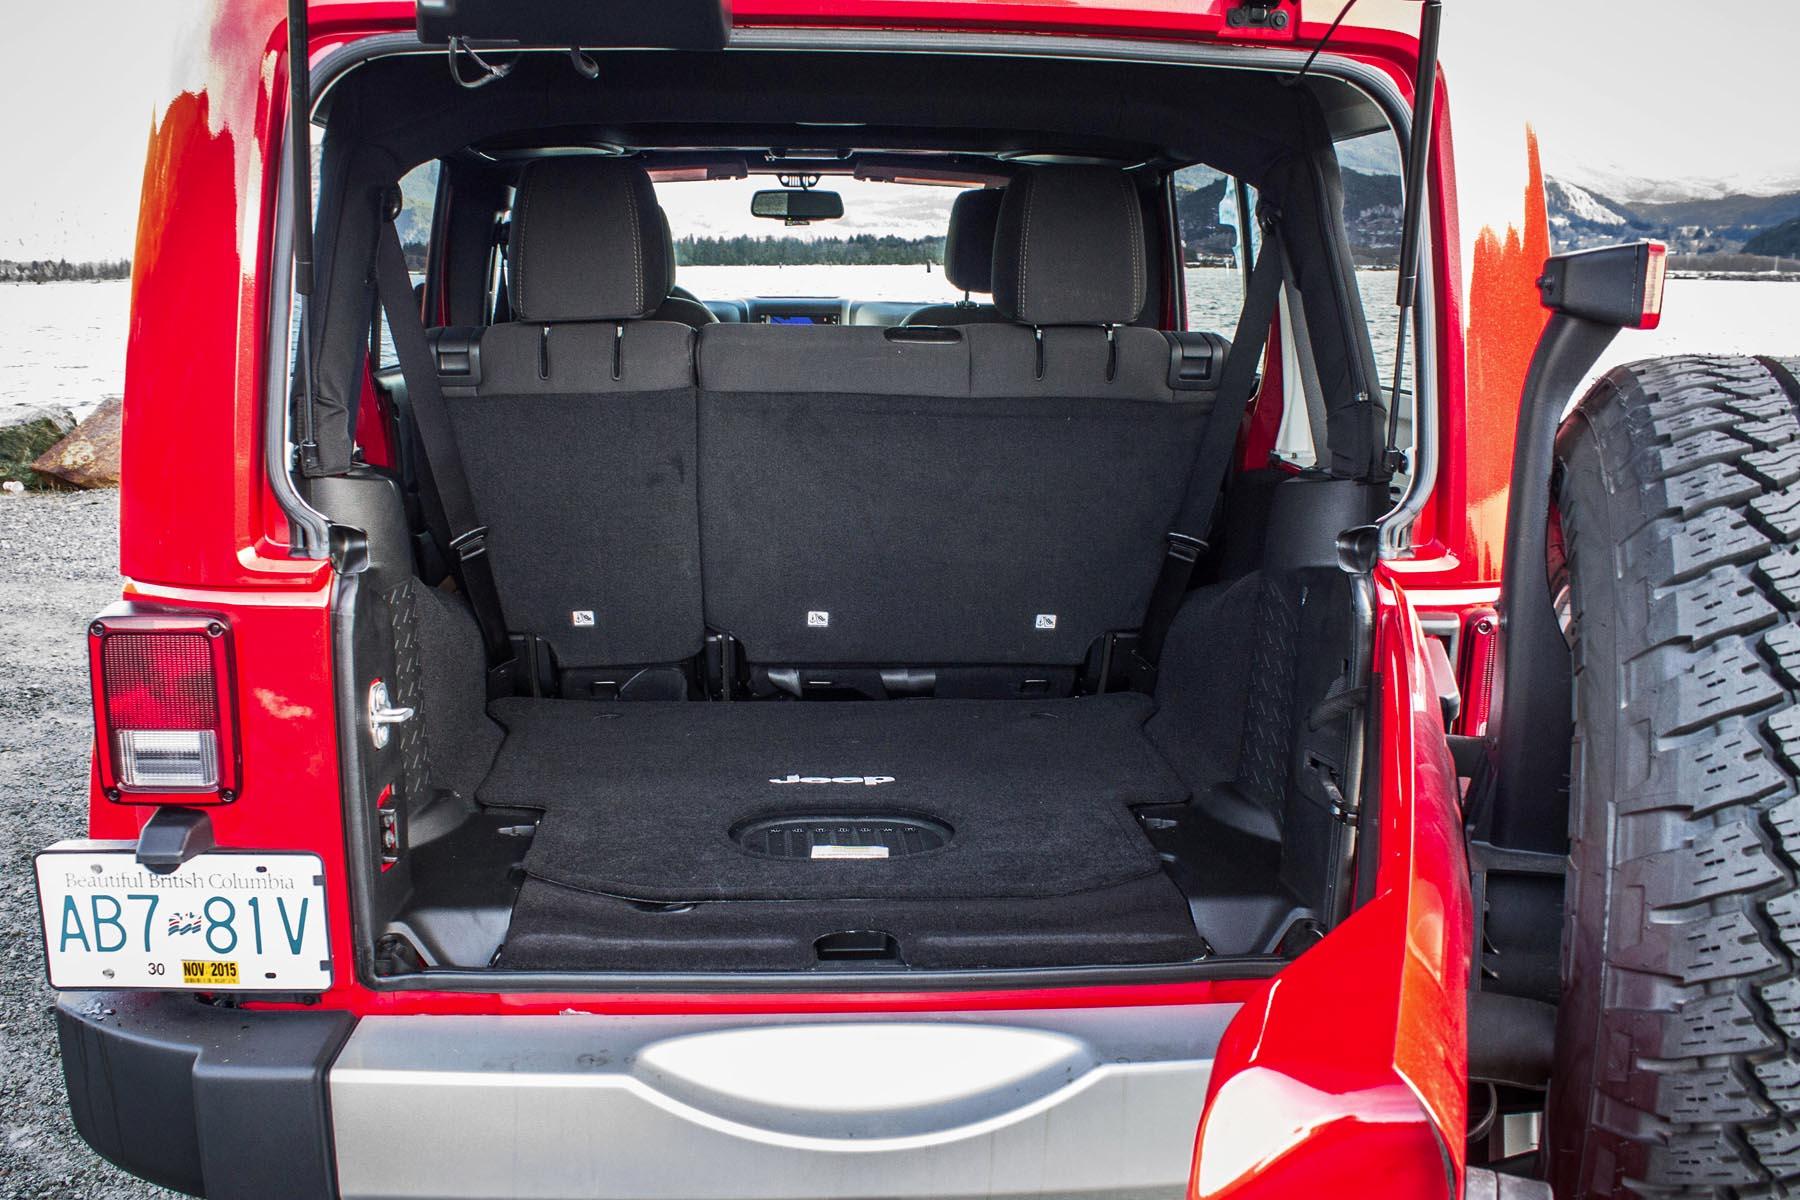 2015 Jeep Wrangler Unlimited Sahara Bm 19